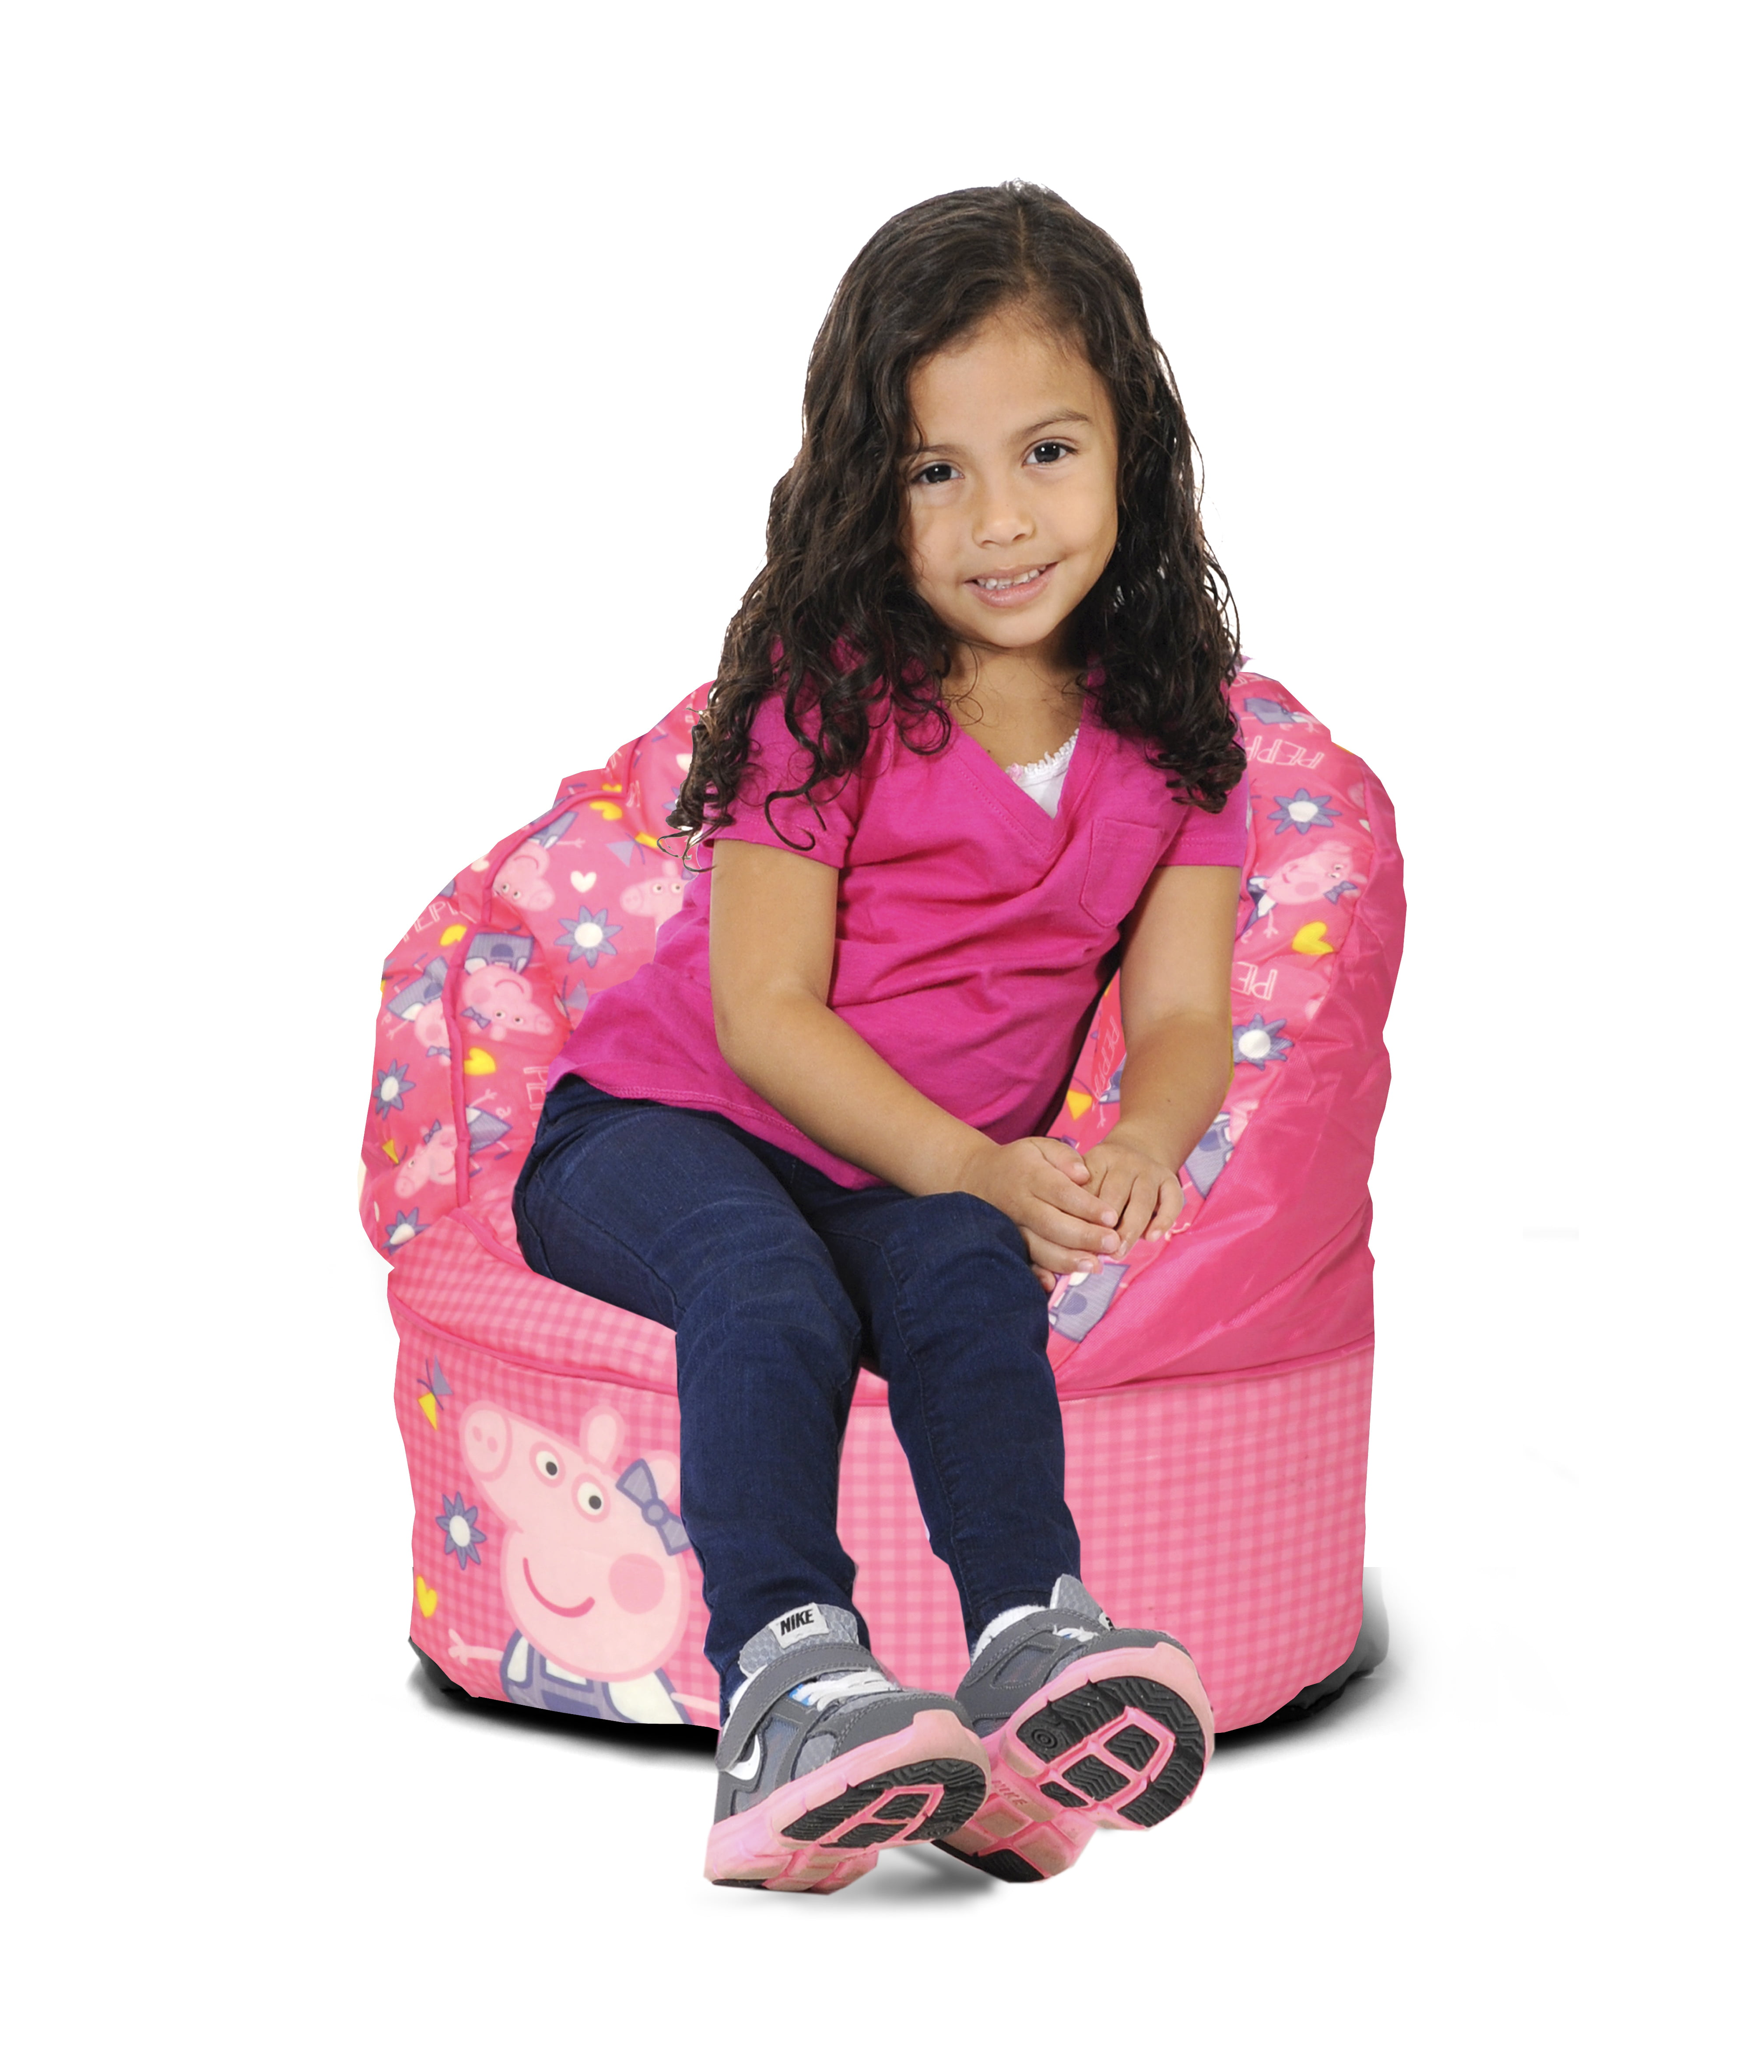 Peppa Pig Kids Bean Bag Chair   Walmart.com